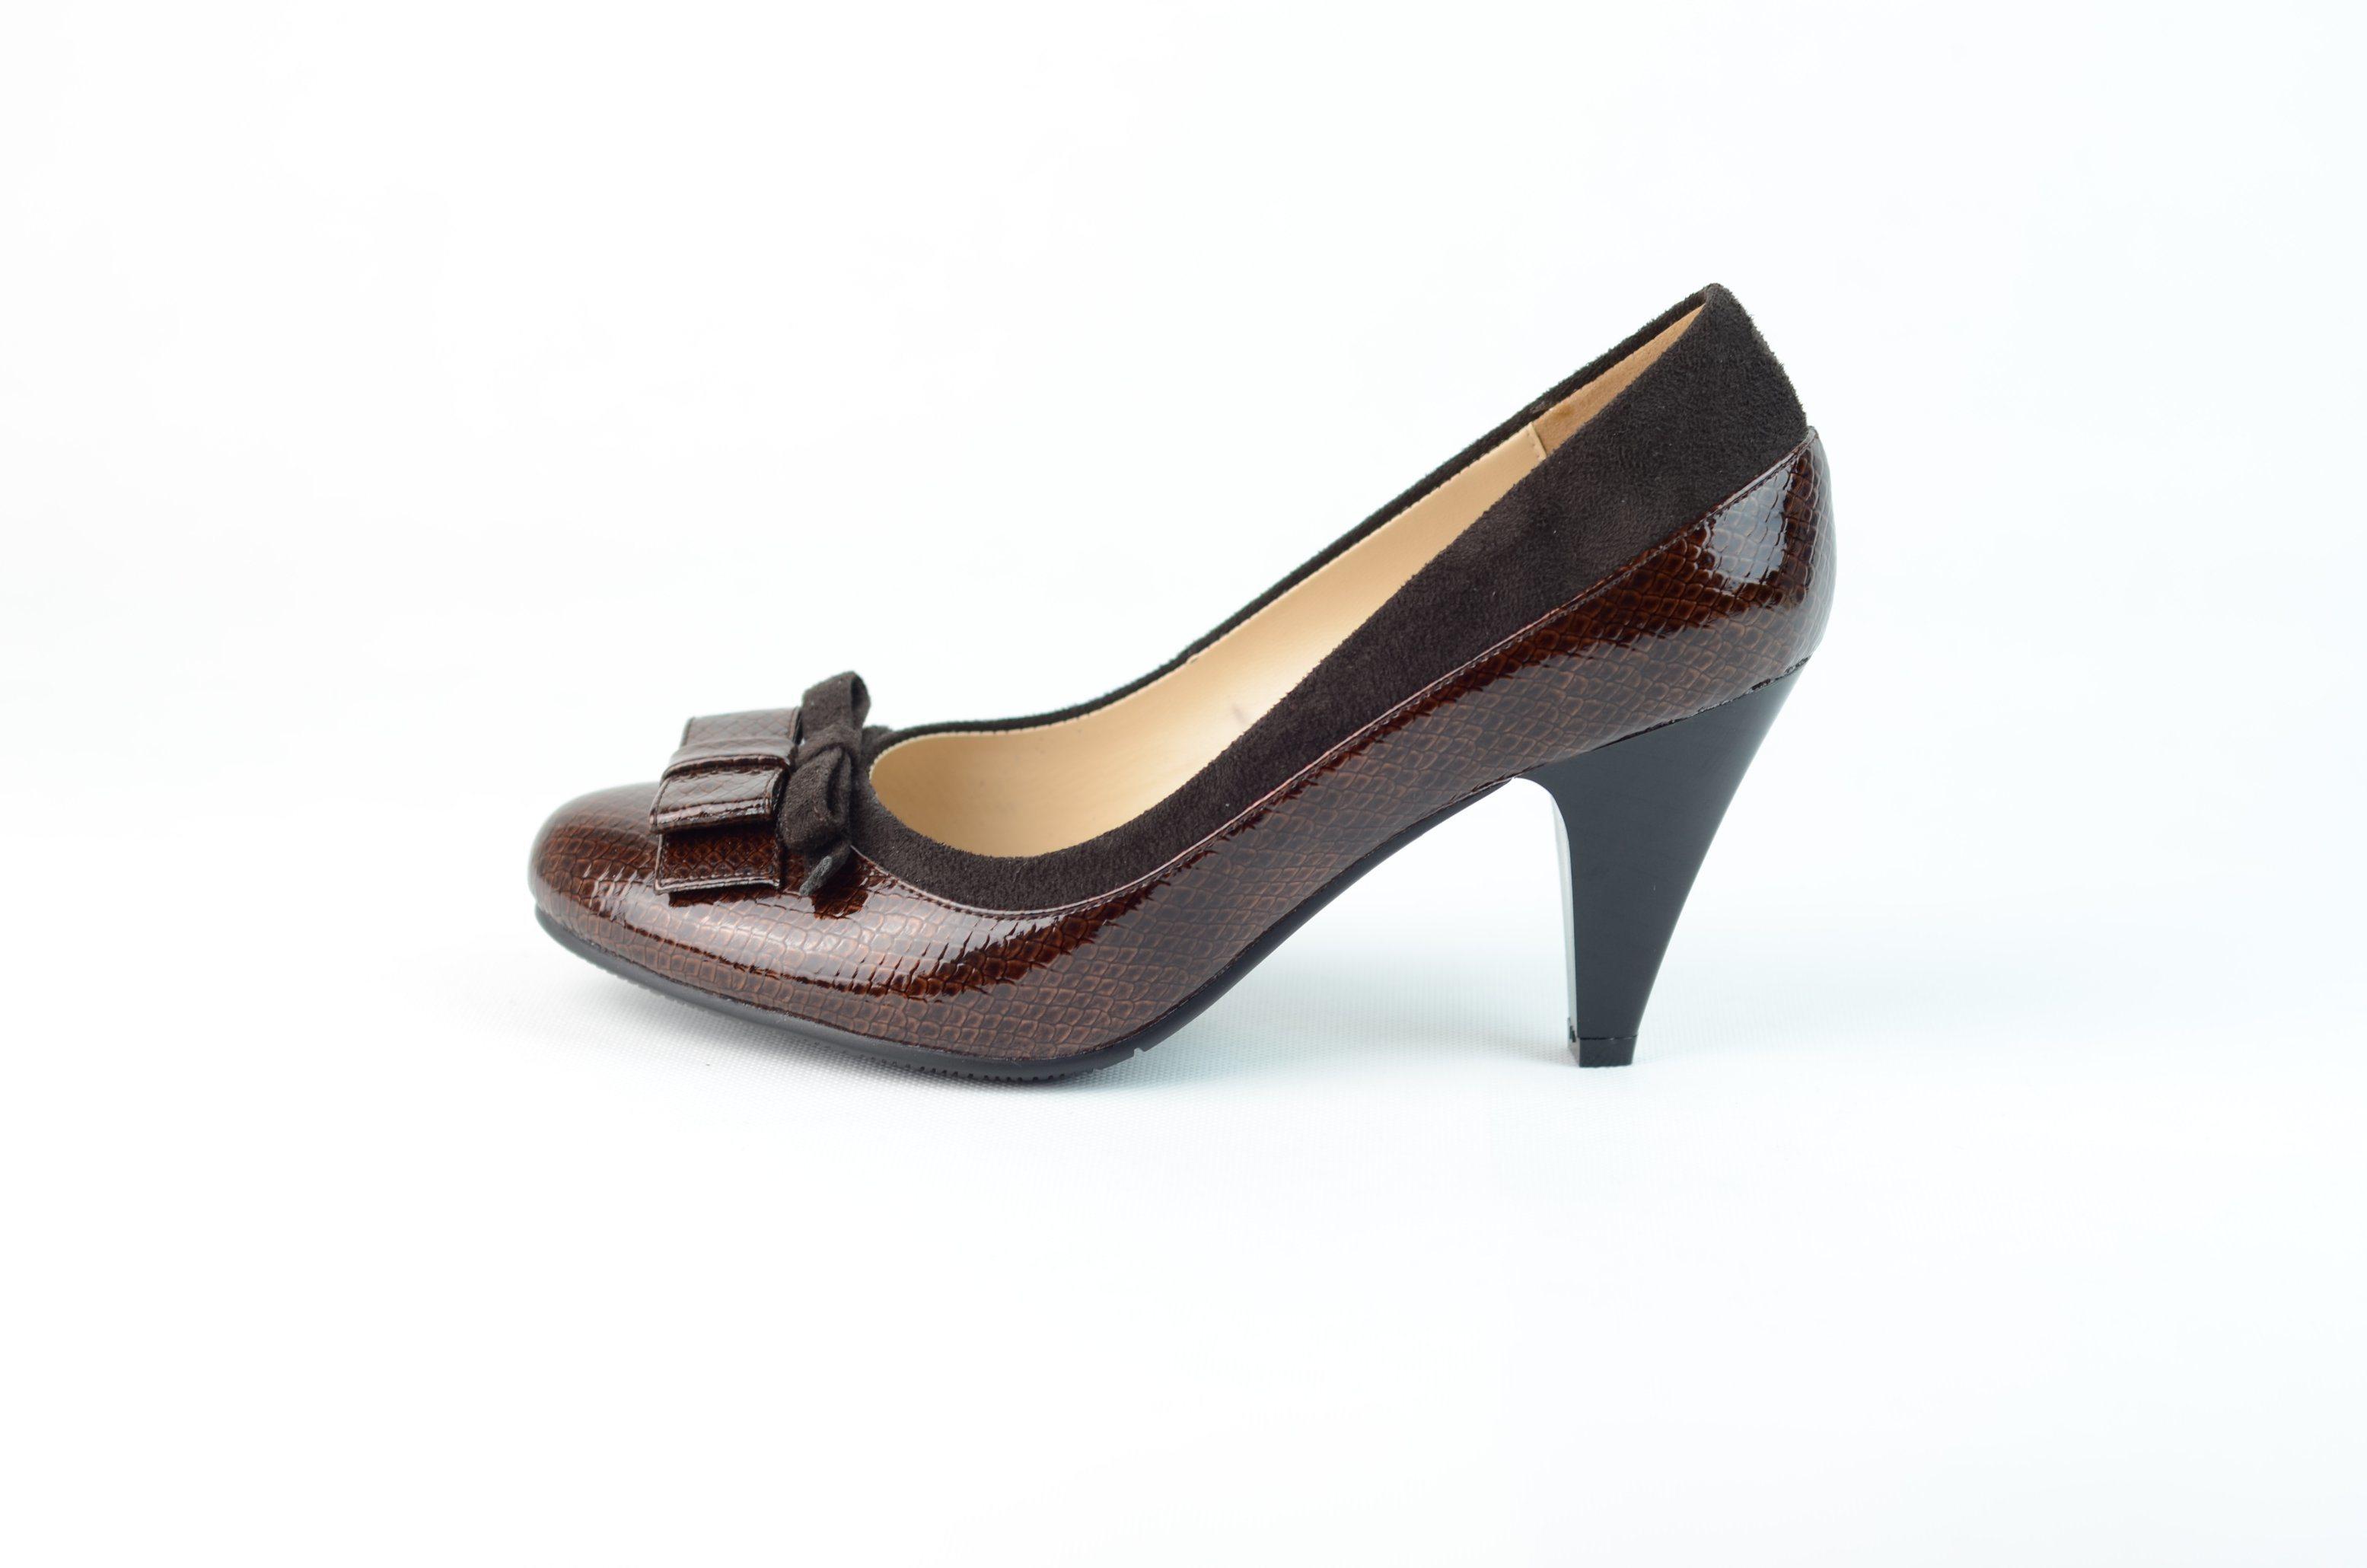 c3ad6e0fda69b8 China Designer Kitten Heel Shoe for Women – China Designer Shoe